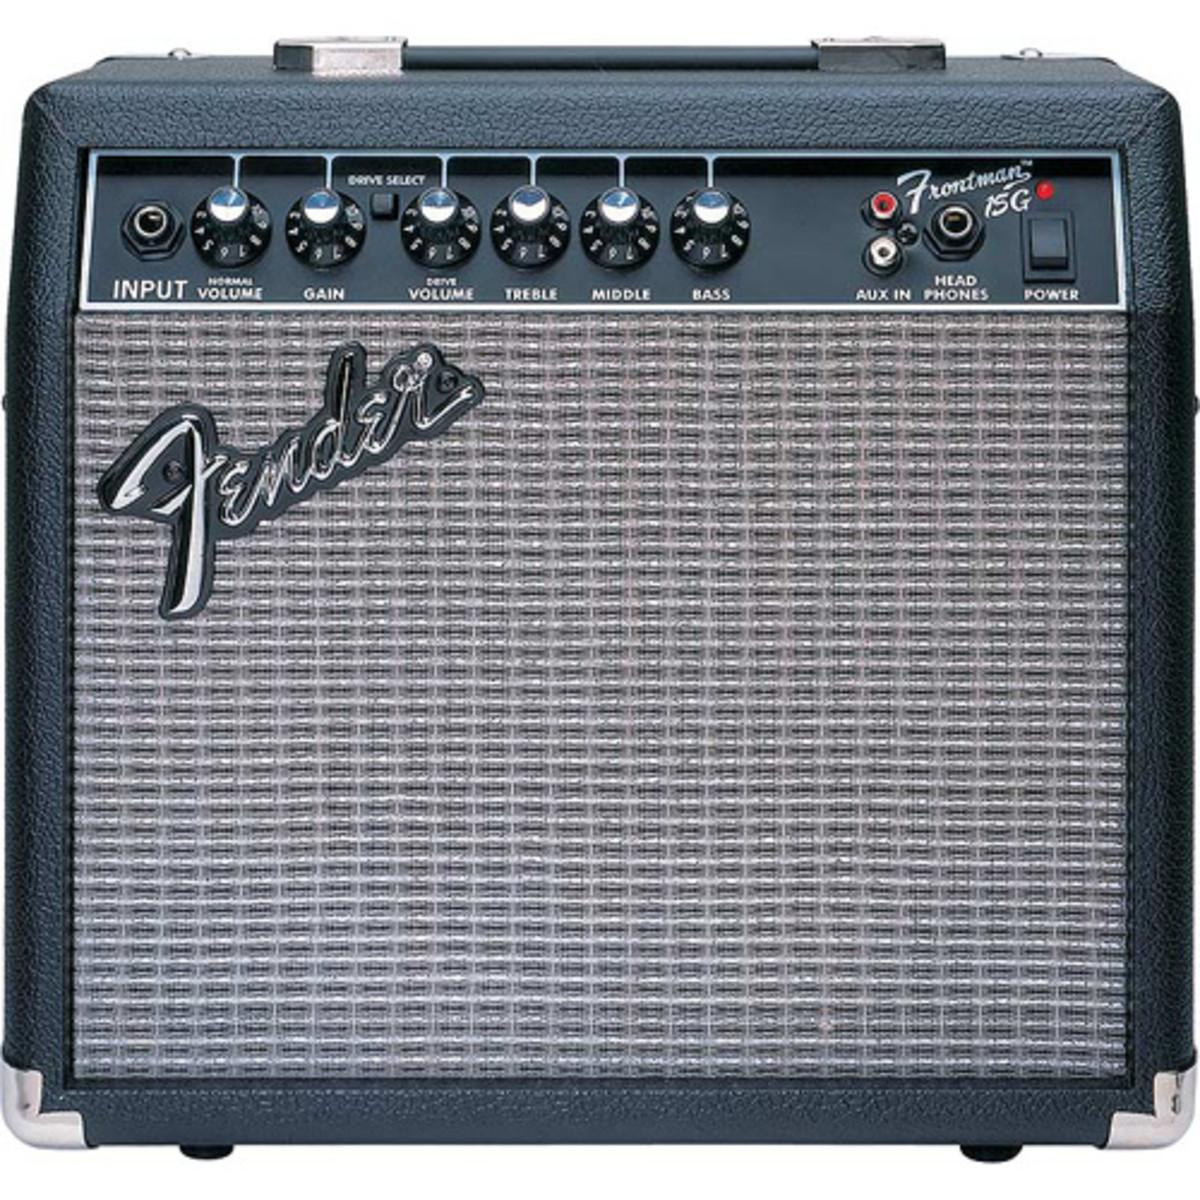 discontinued fender frontman amp 15g at gear4music. Black Bedroom Furniture Sets. Home Design Ideas